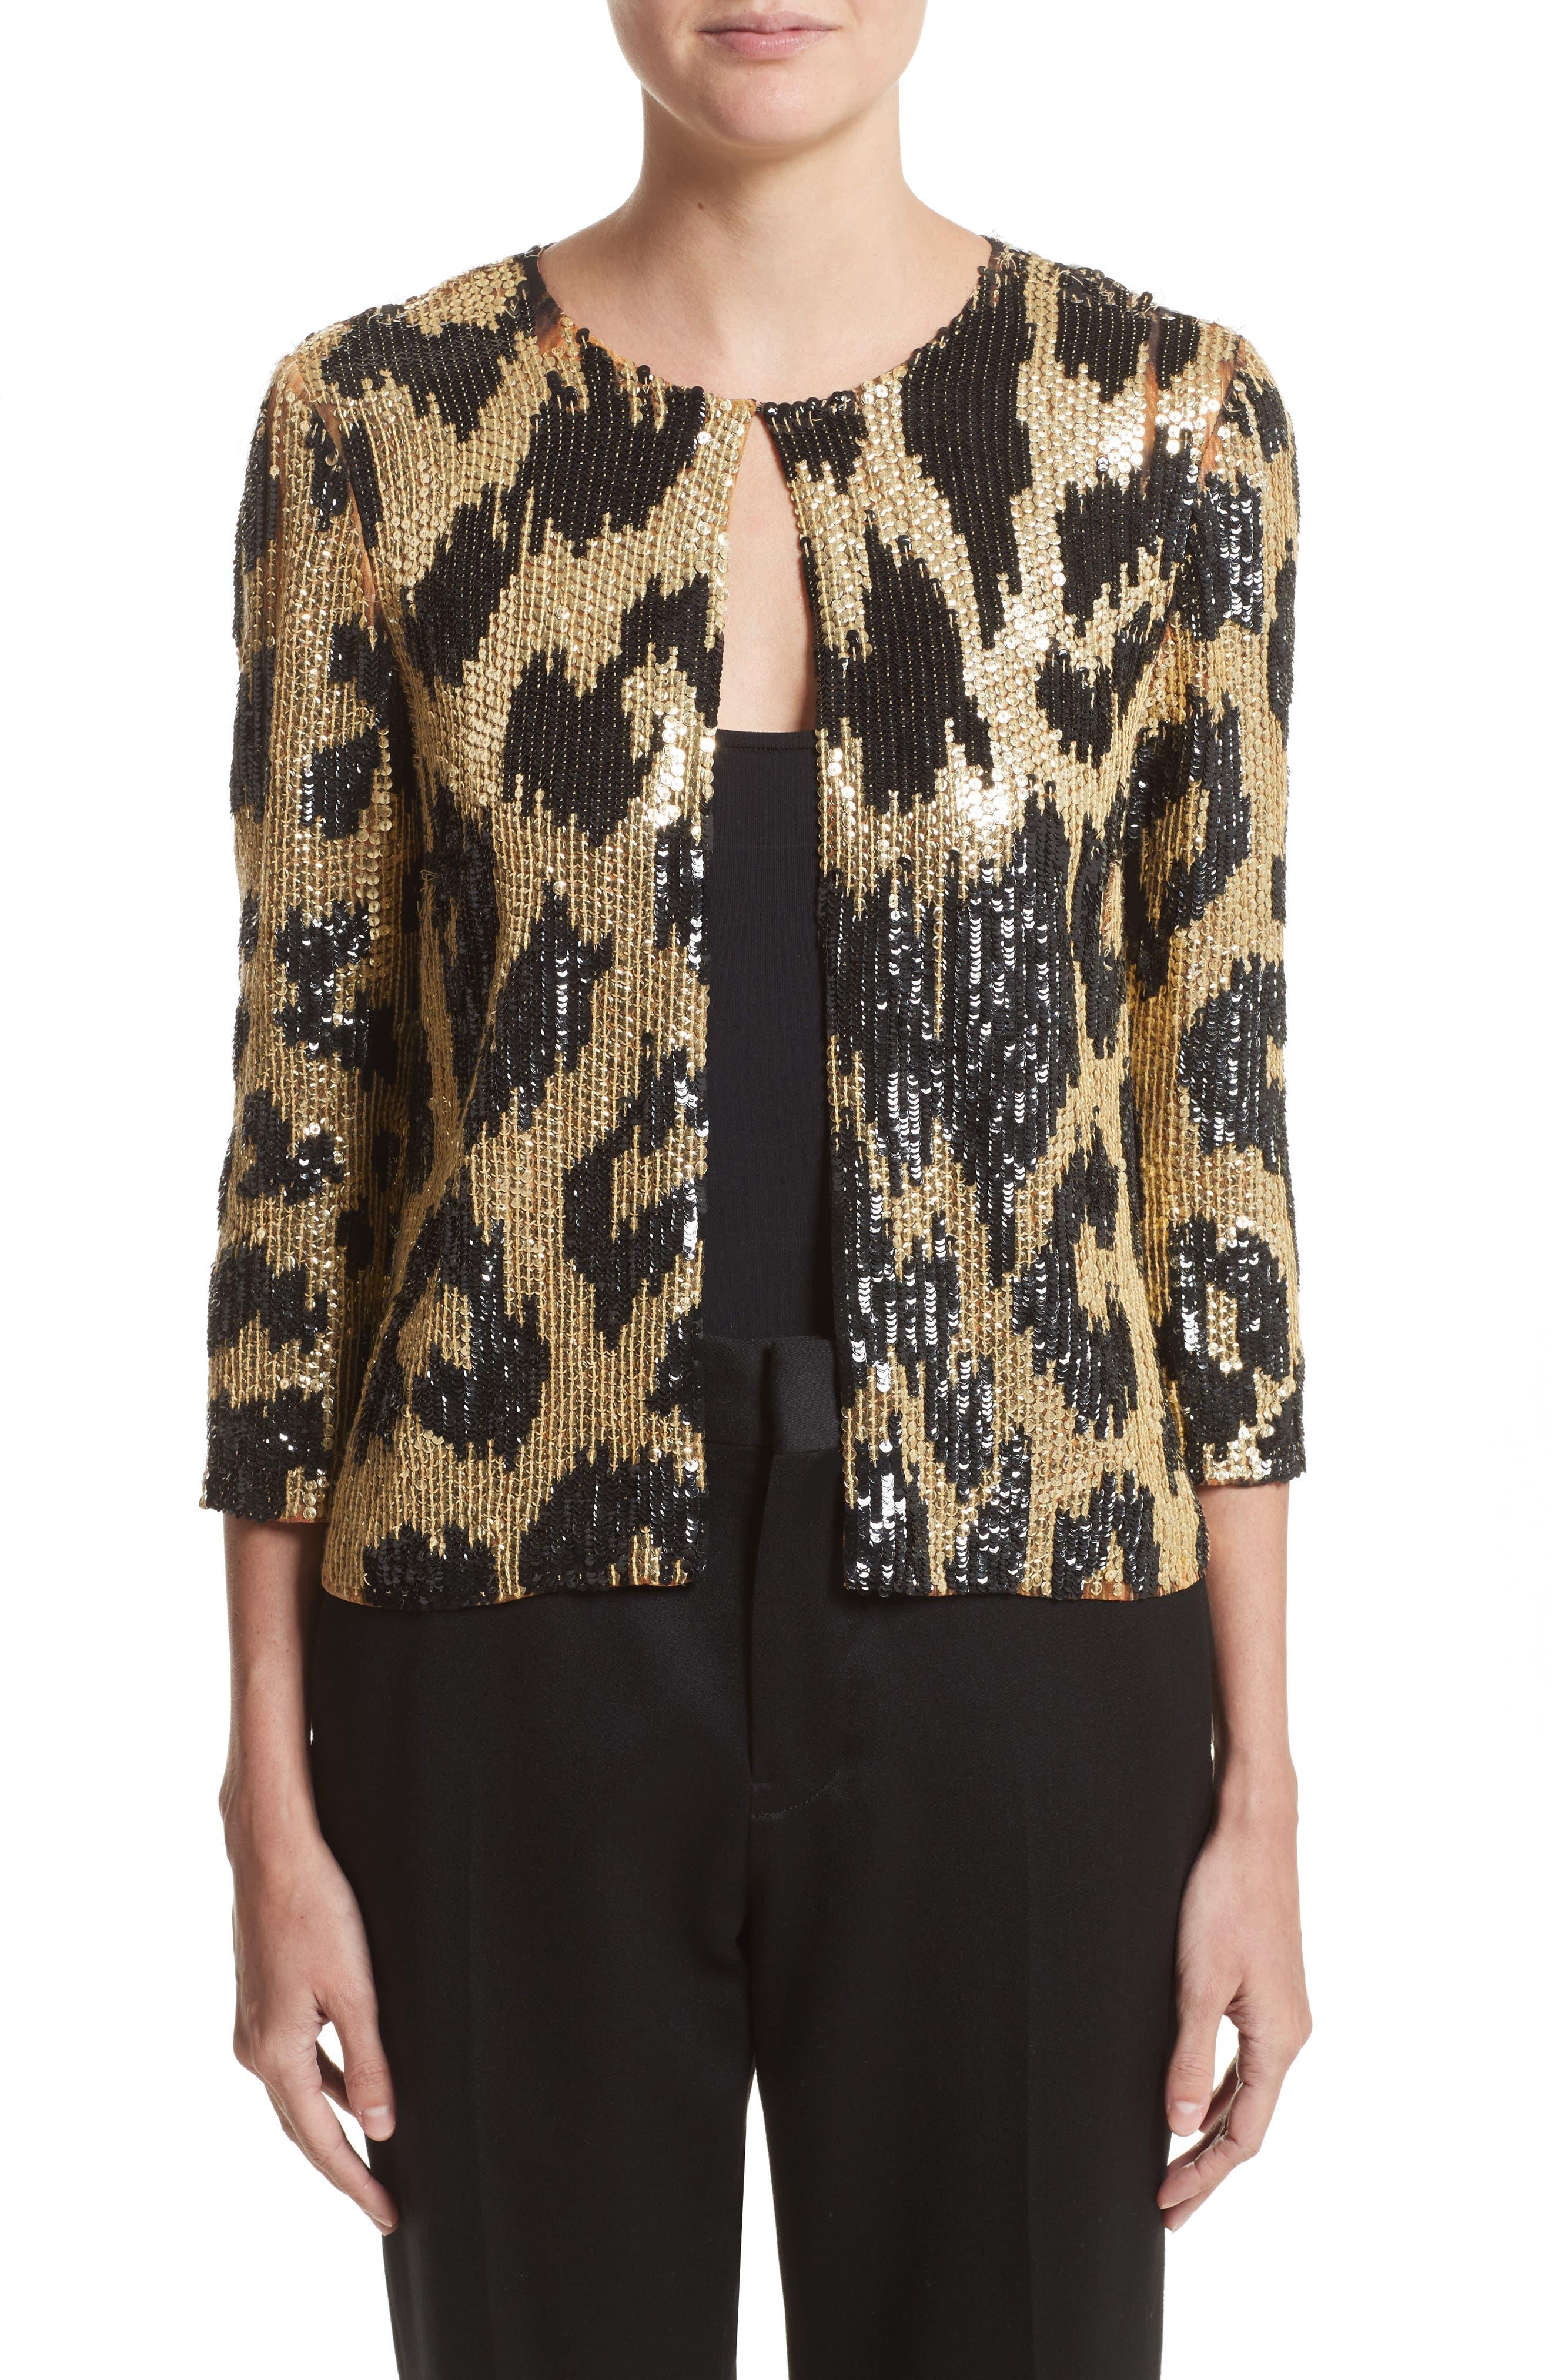 Cheetah Print Sequin Jacket,                         Main,                         color, Black/ Gold